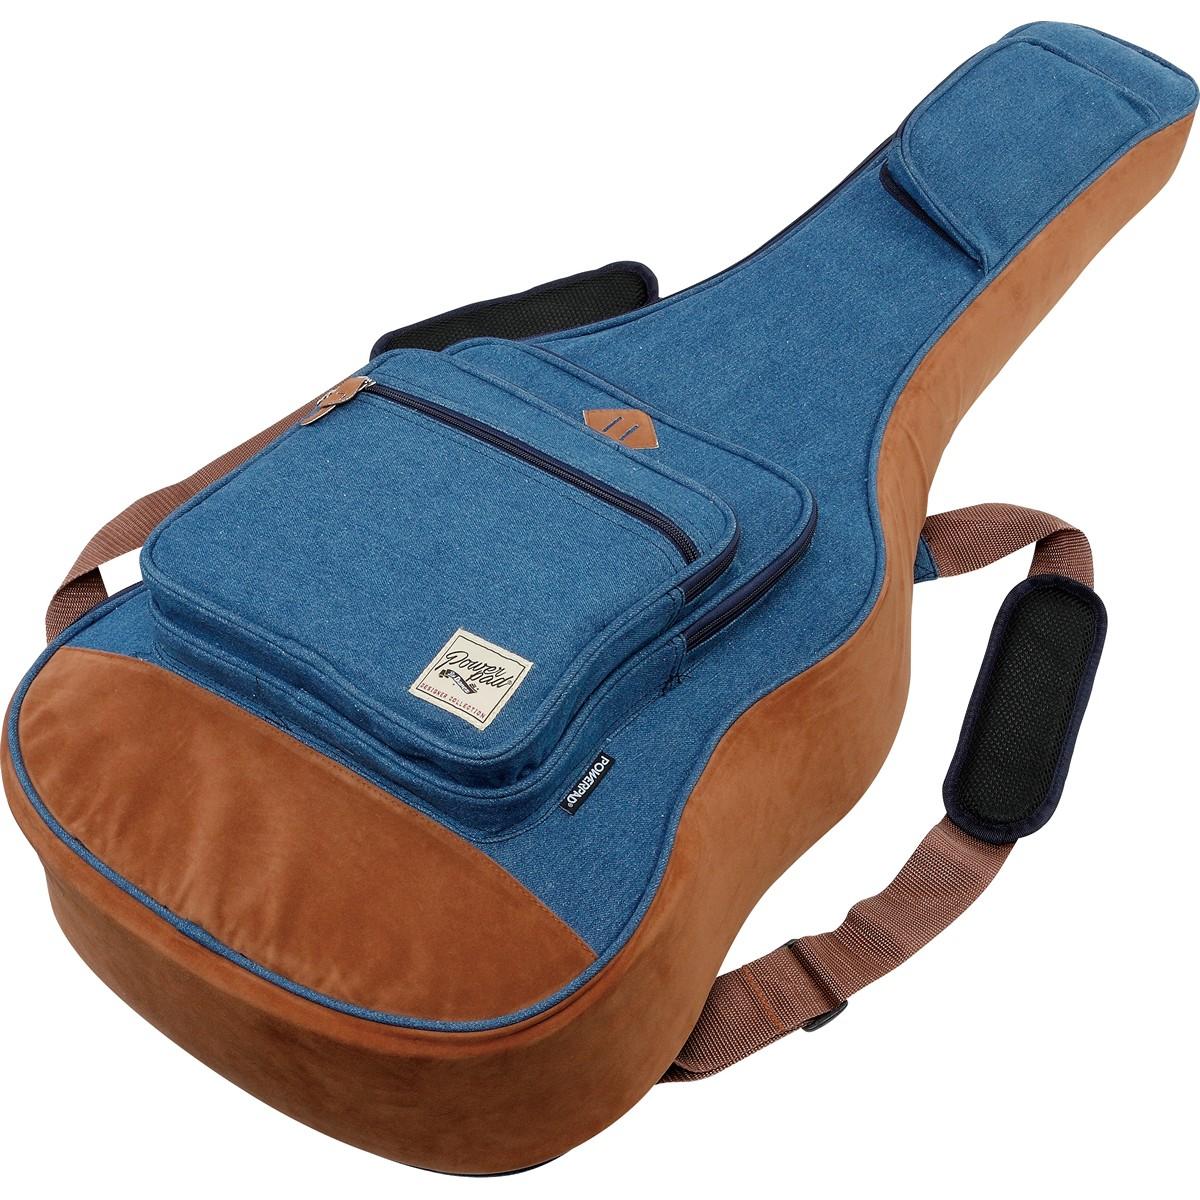 IBANEZ ICB541D-BL BLUE BAG CLASSICAL GUITAR